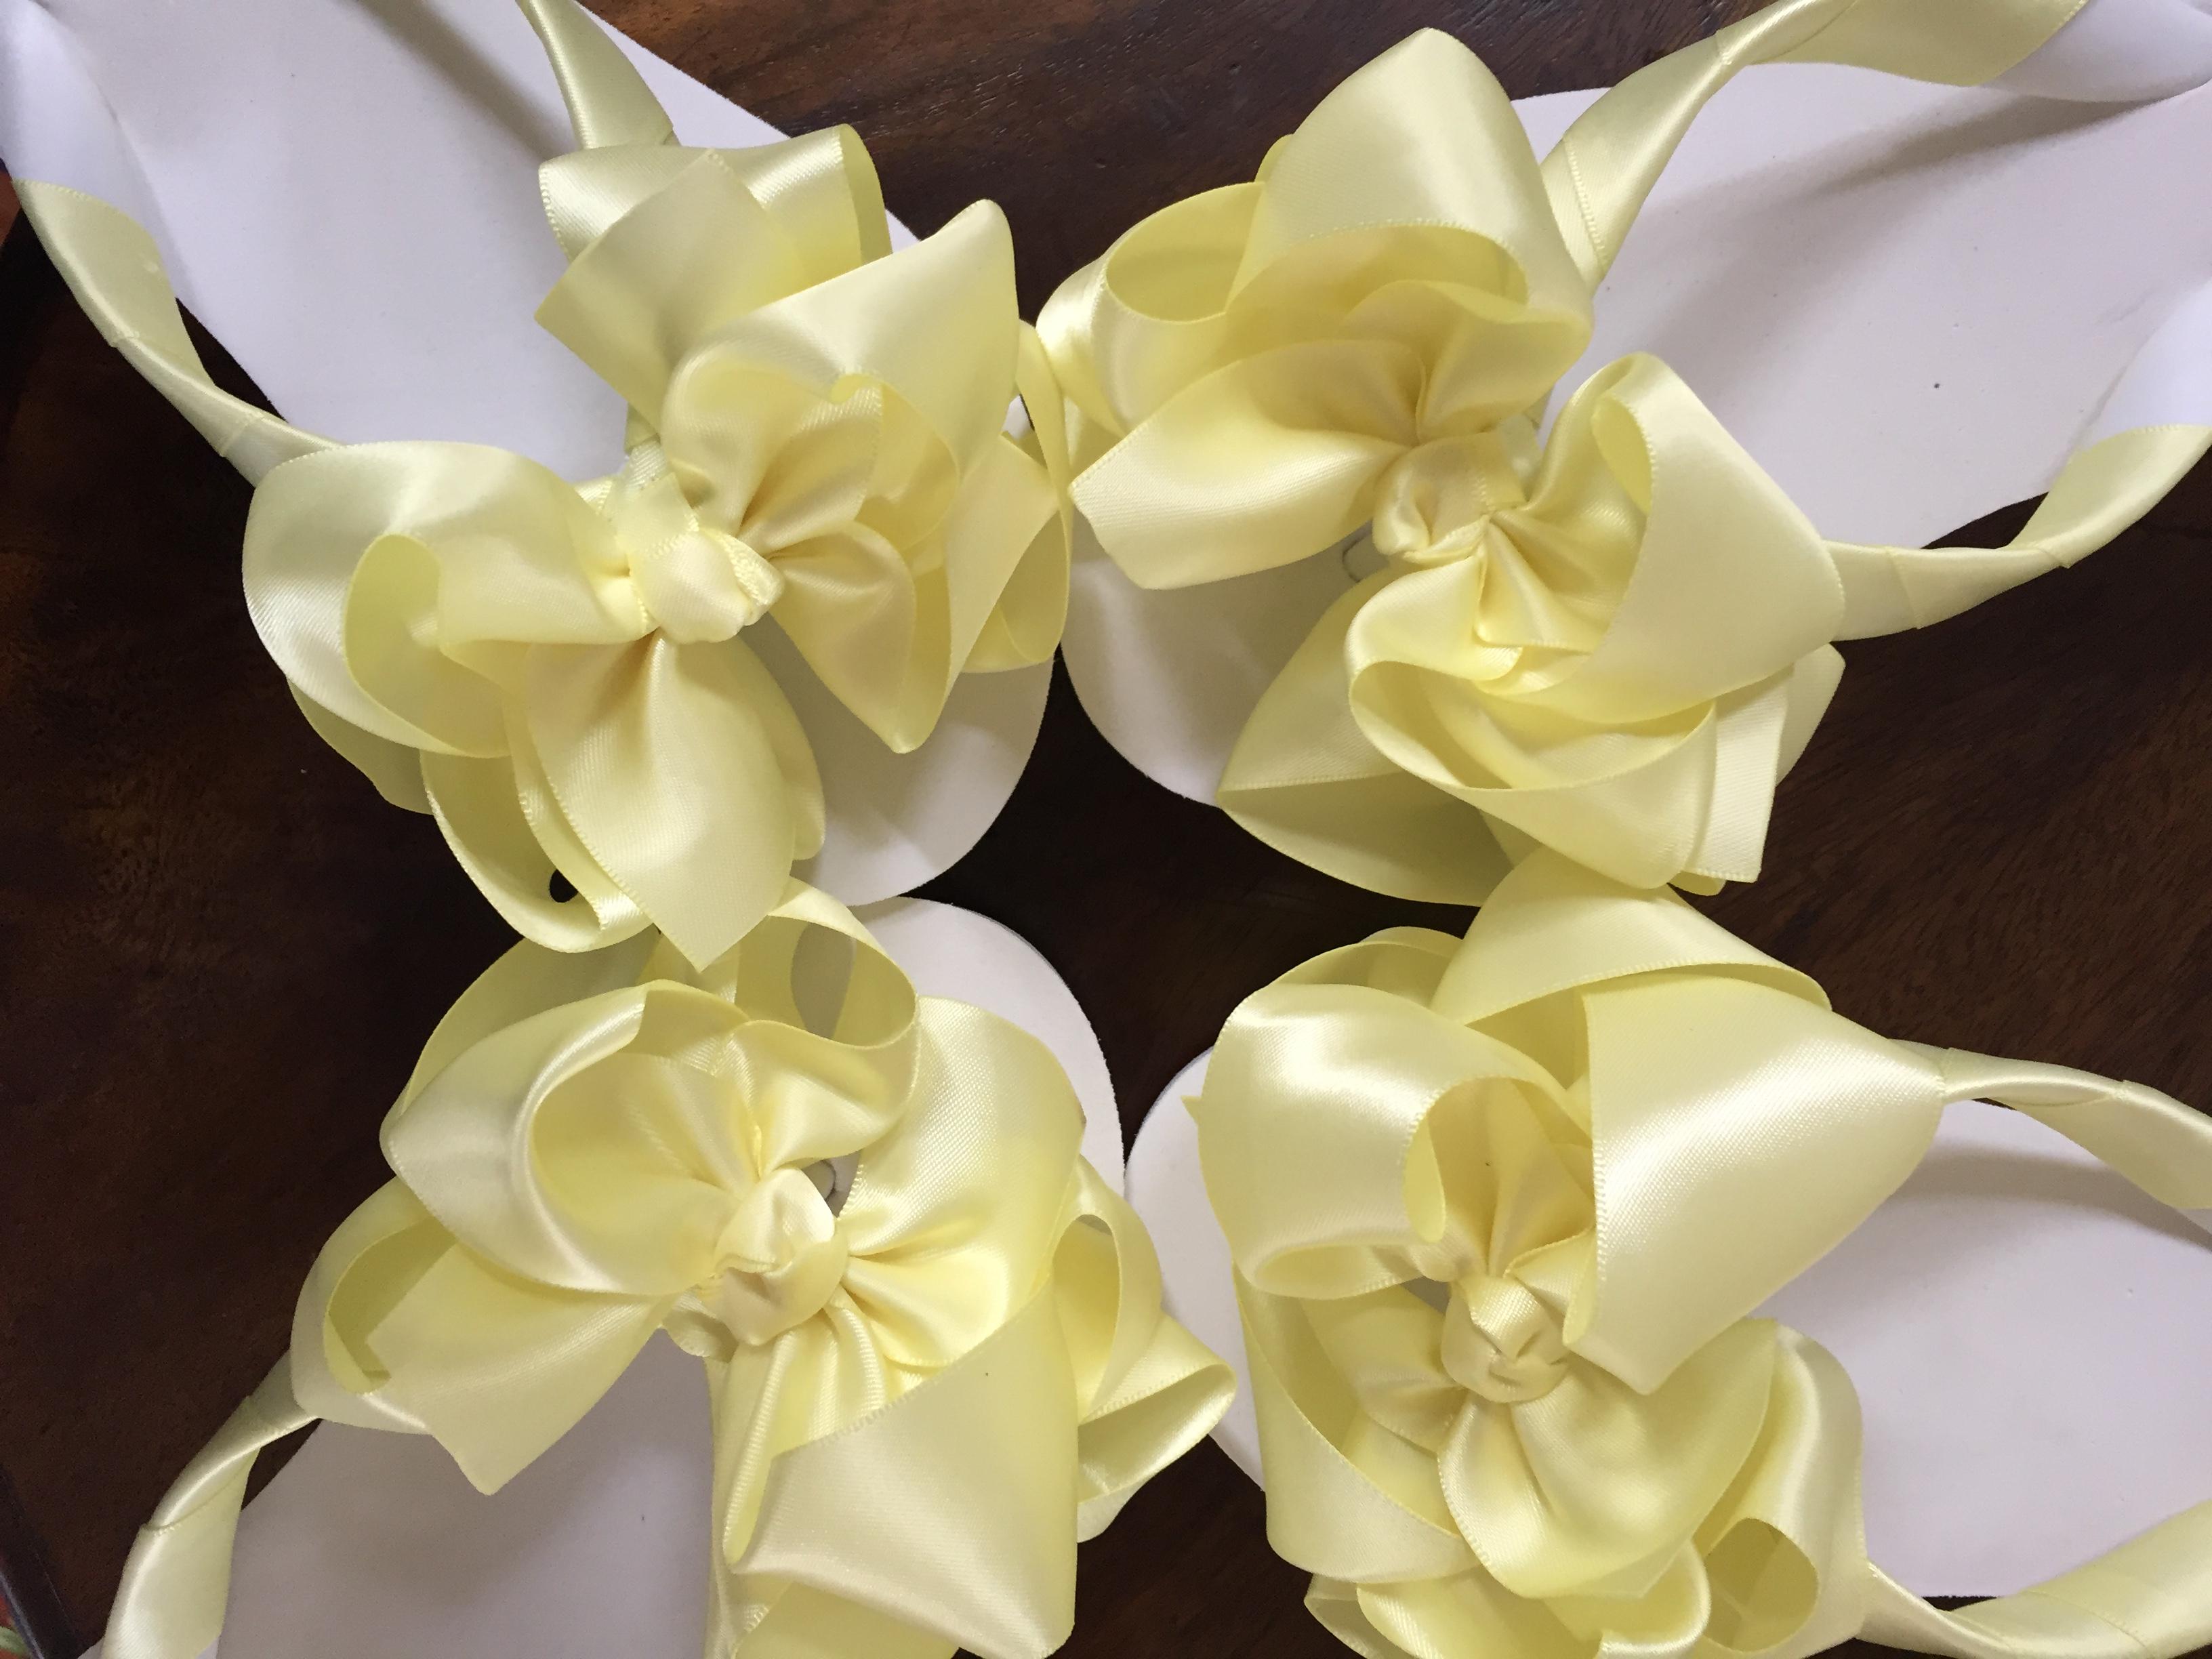 Bridesmaids Flip Flops in Lemon